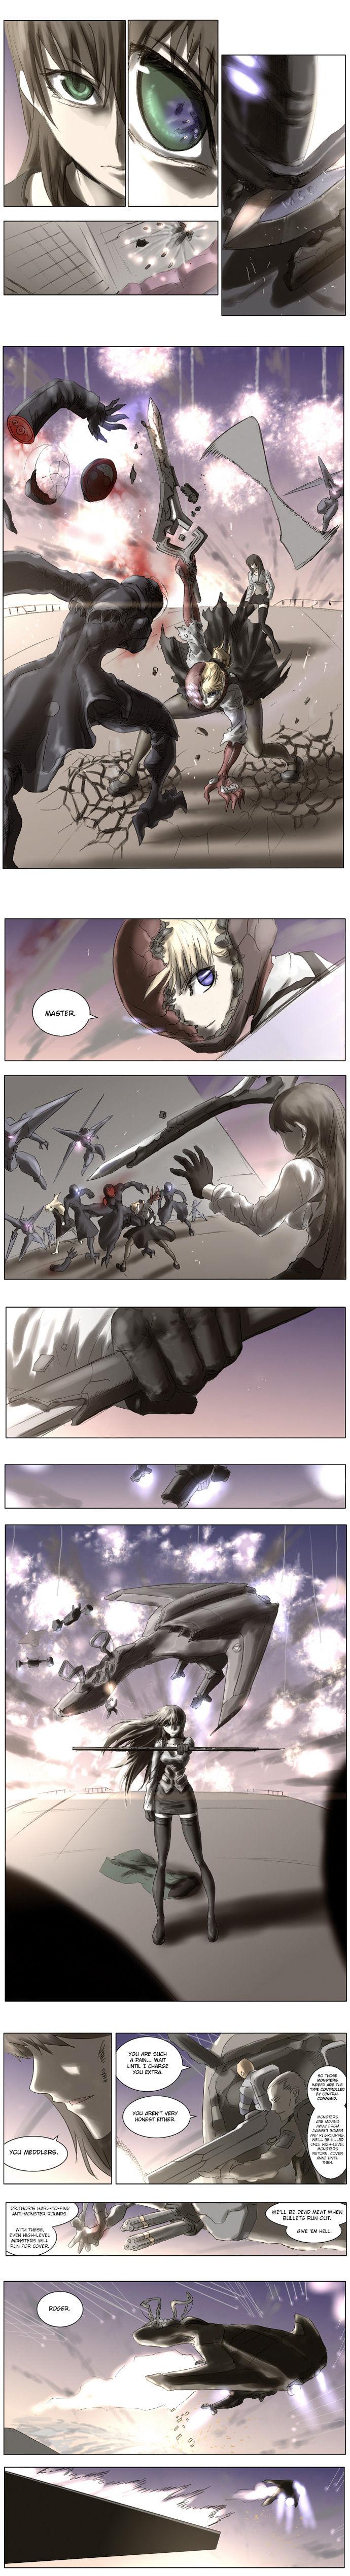 Knight Run 71 Page 2